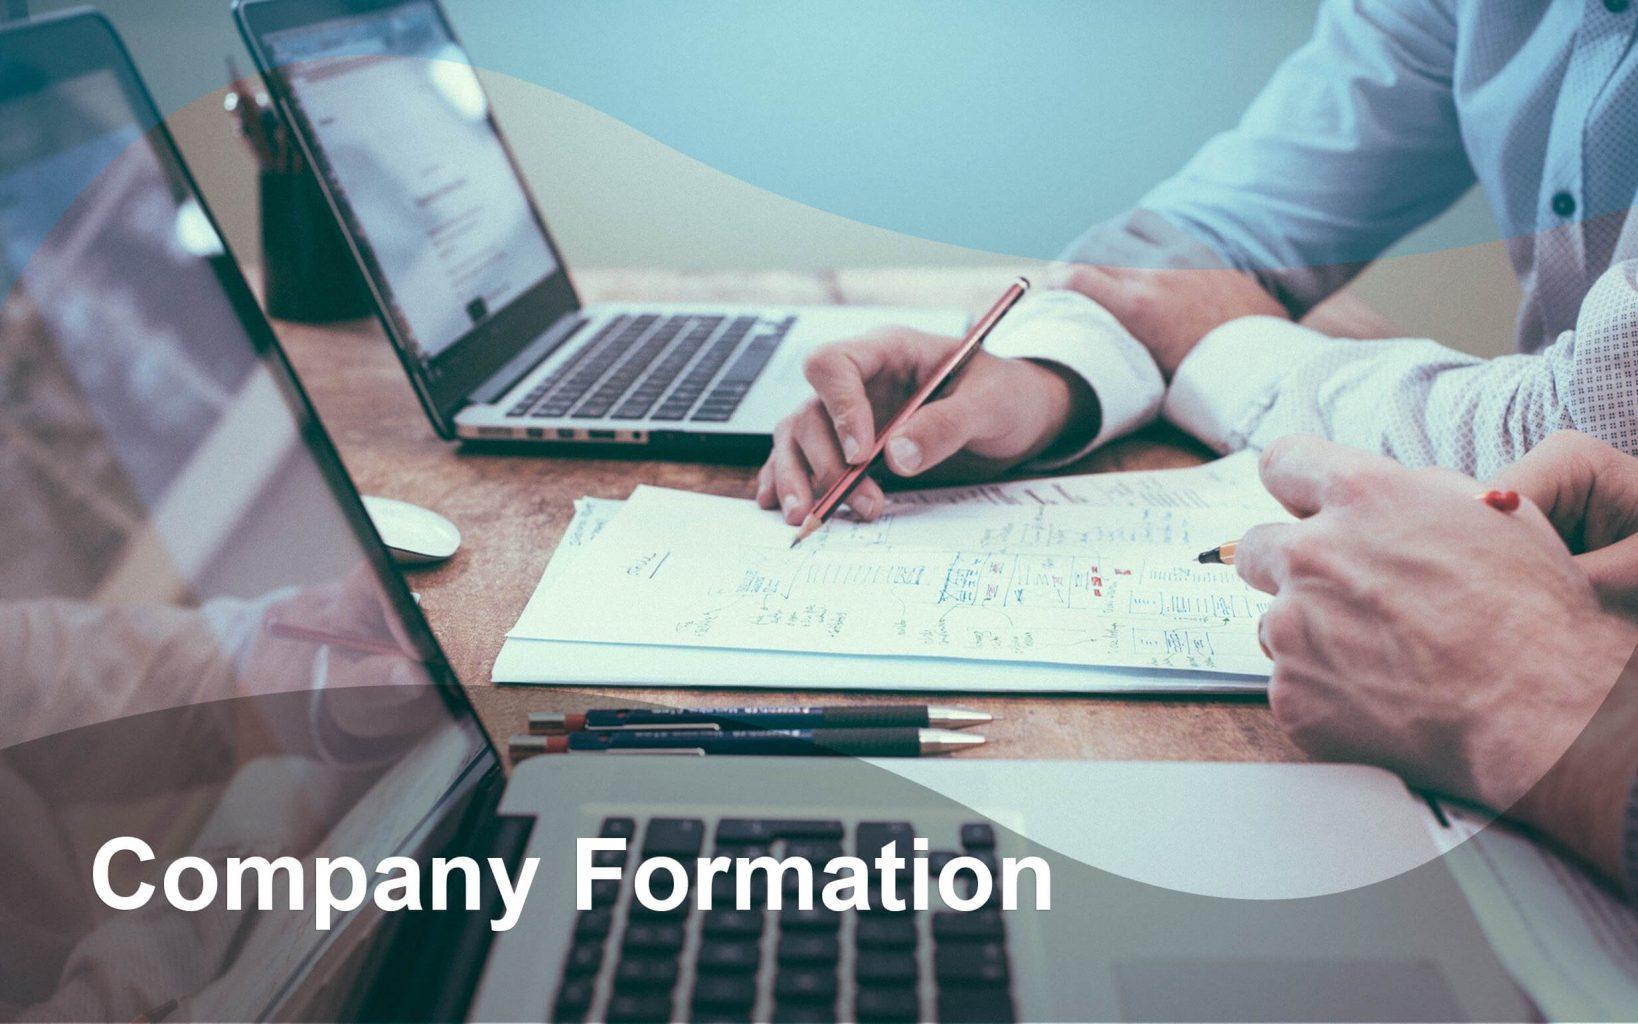 Company Formation in Latin America